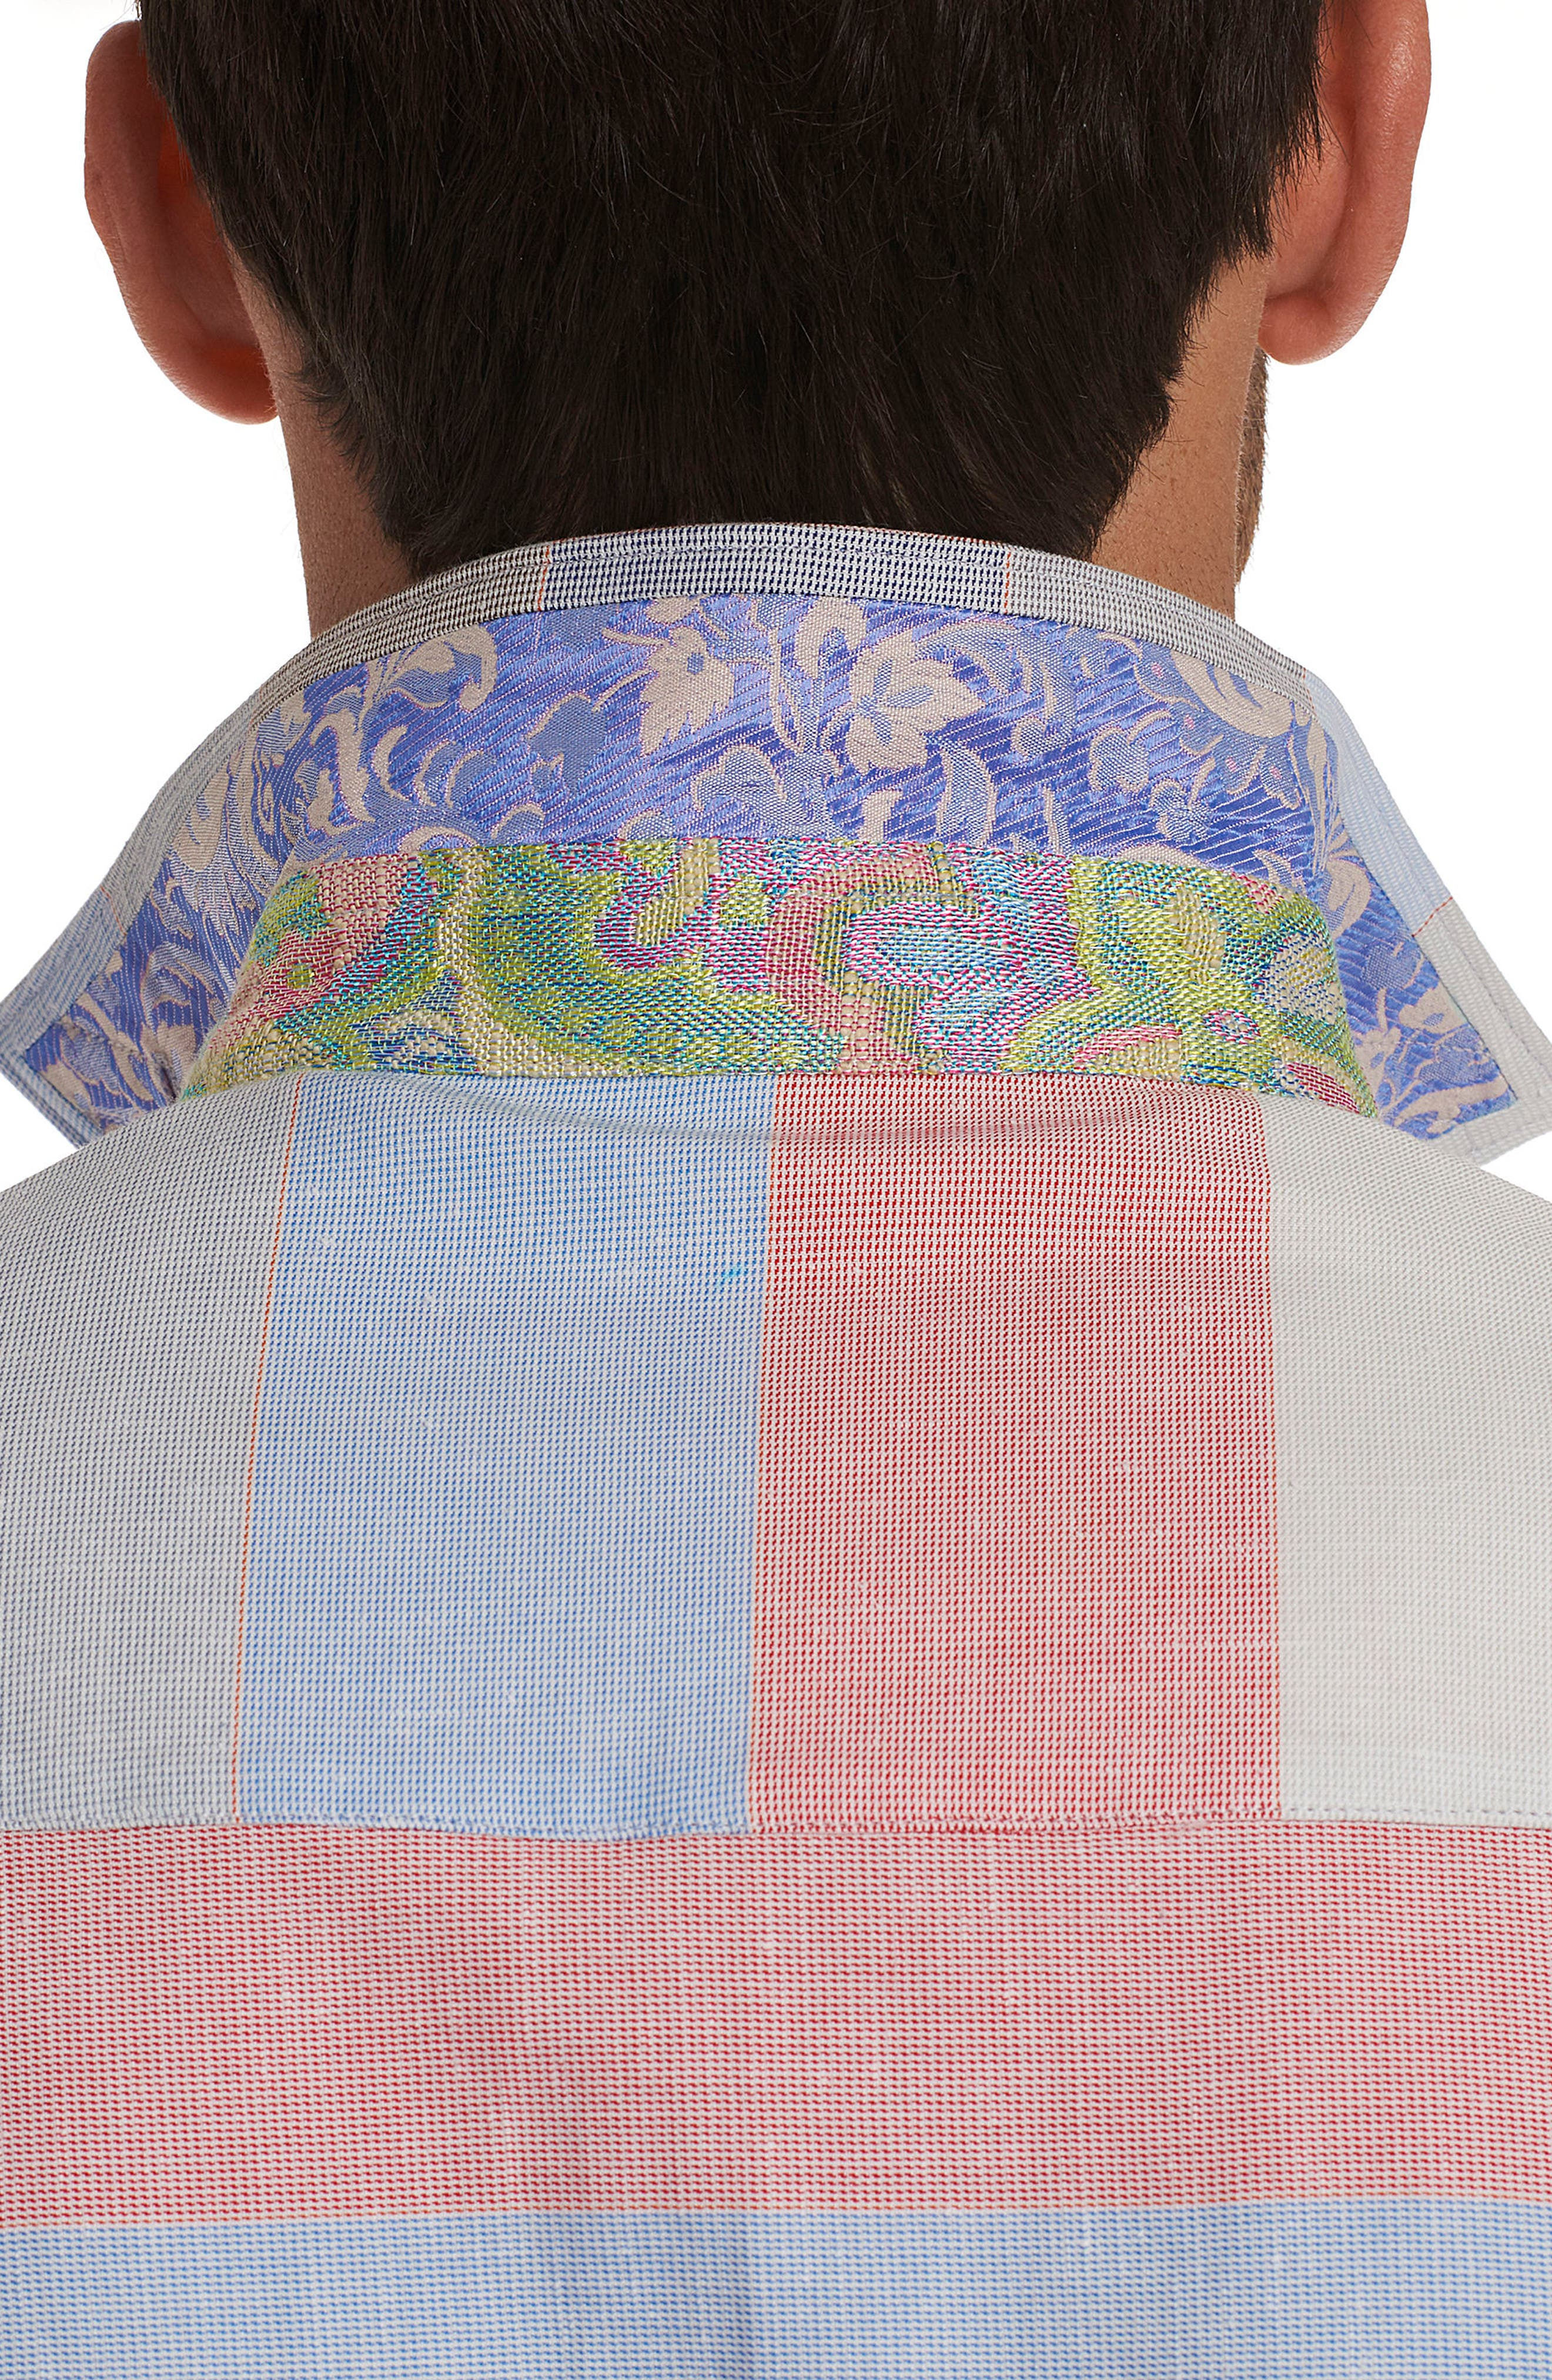 Denim Rays Limited Edition Sport Shirt,                             Alternate thumbnail 3, color,                             400